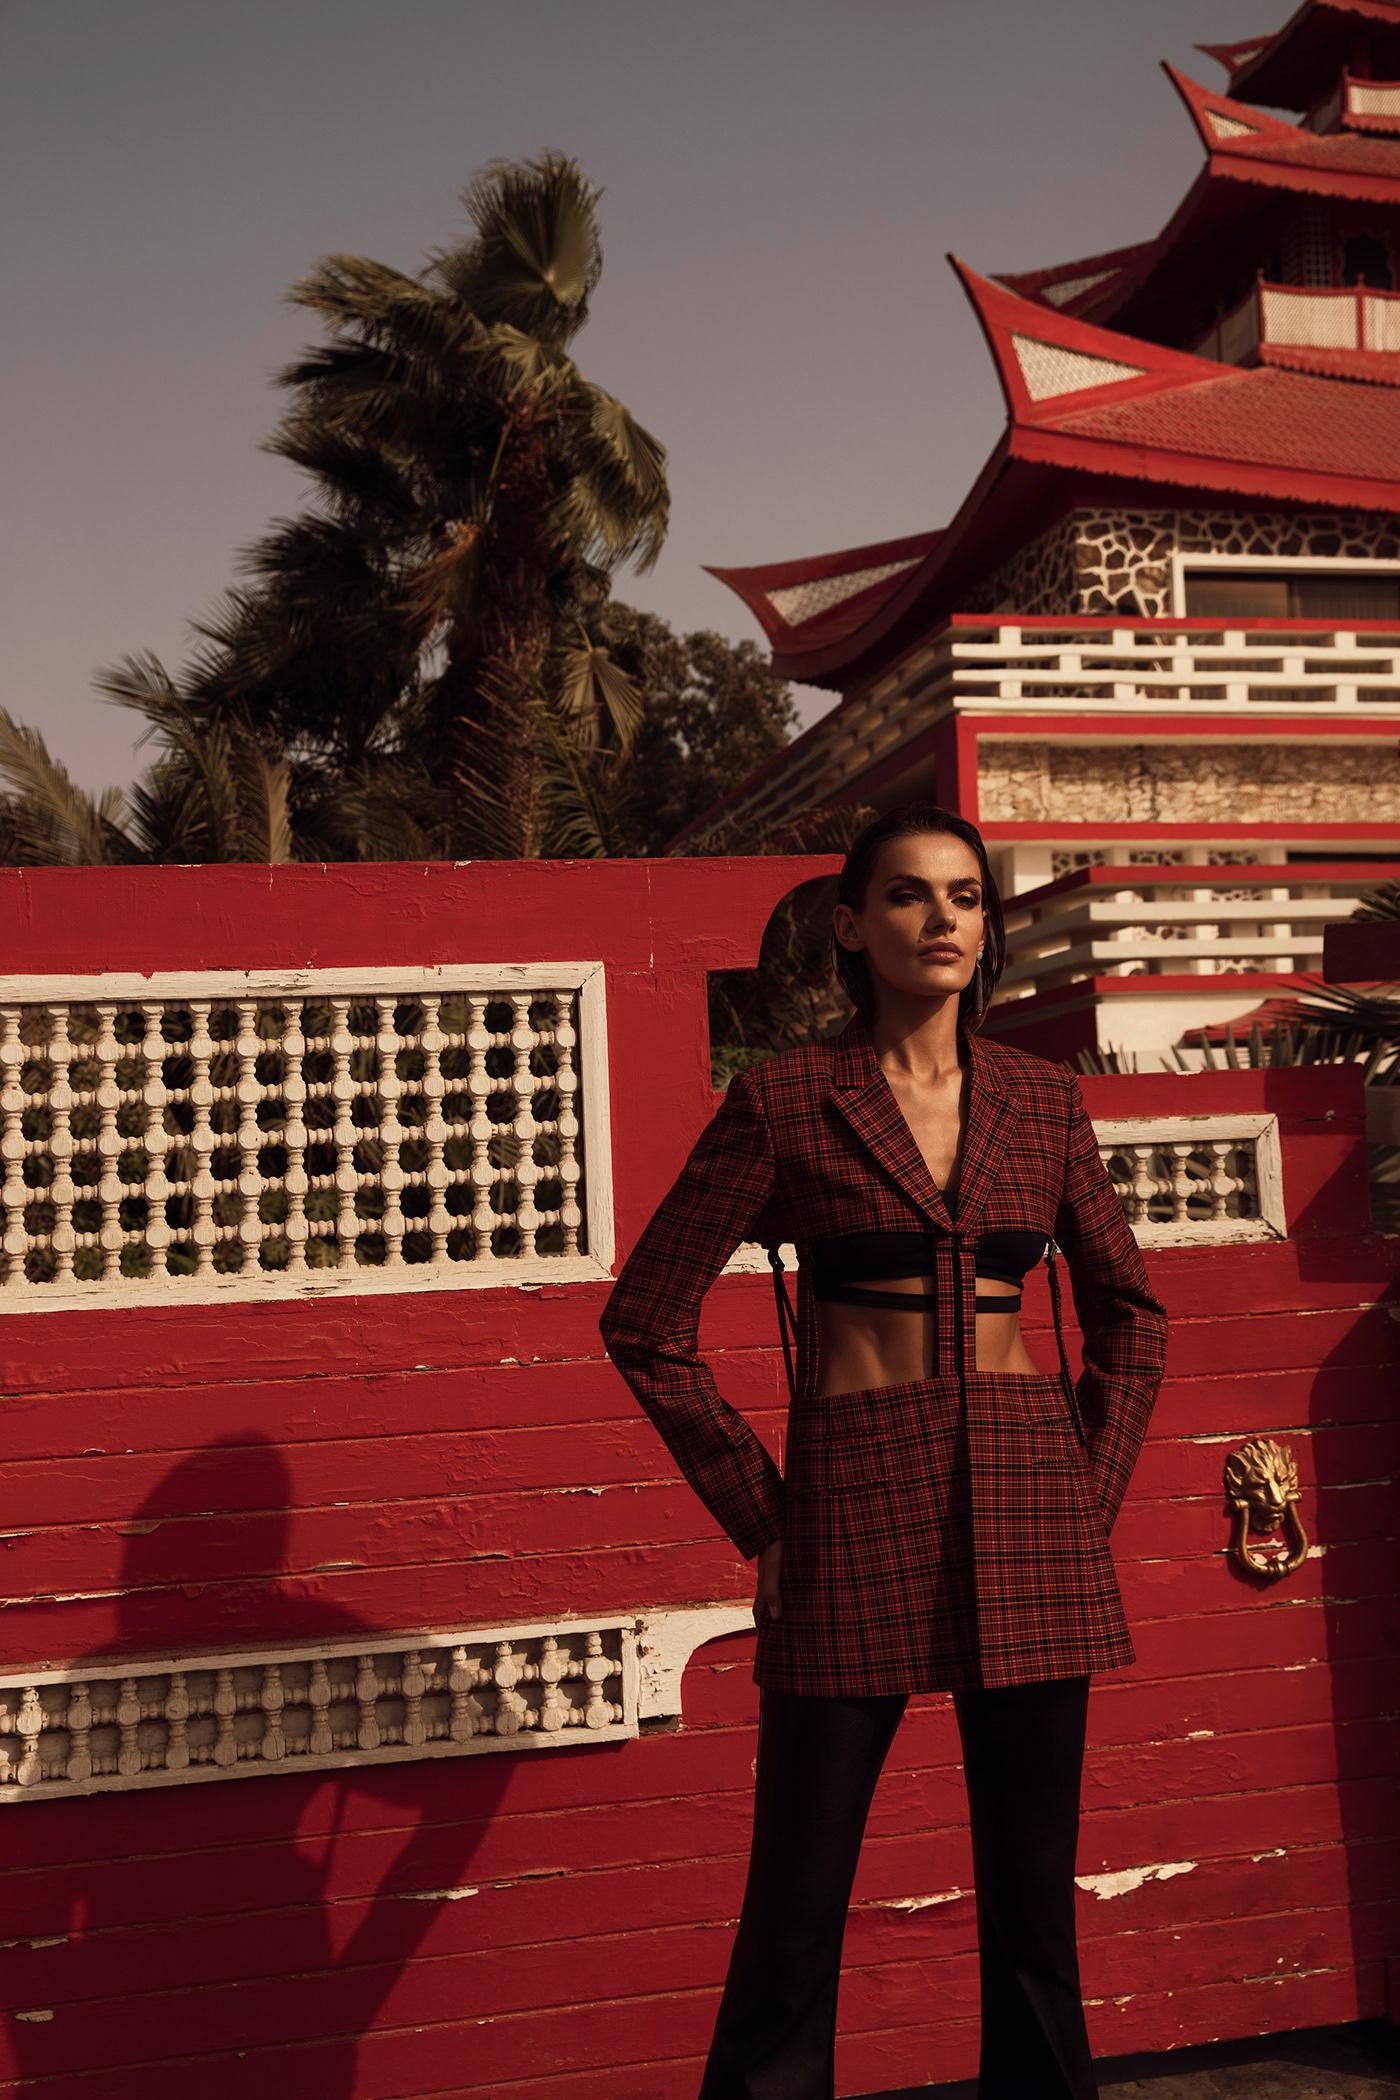 ADA dubai editorial Fashion  julia chernih mmg photographer Photography  UAE